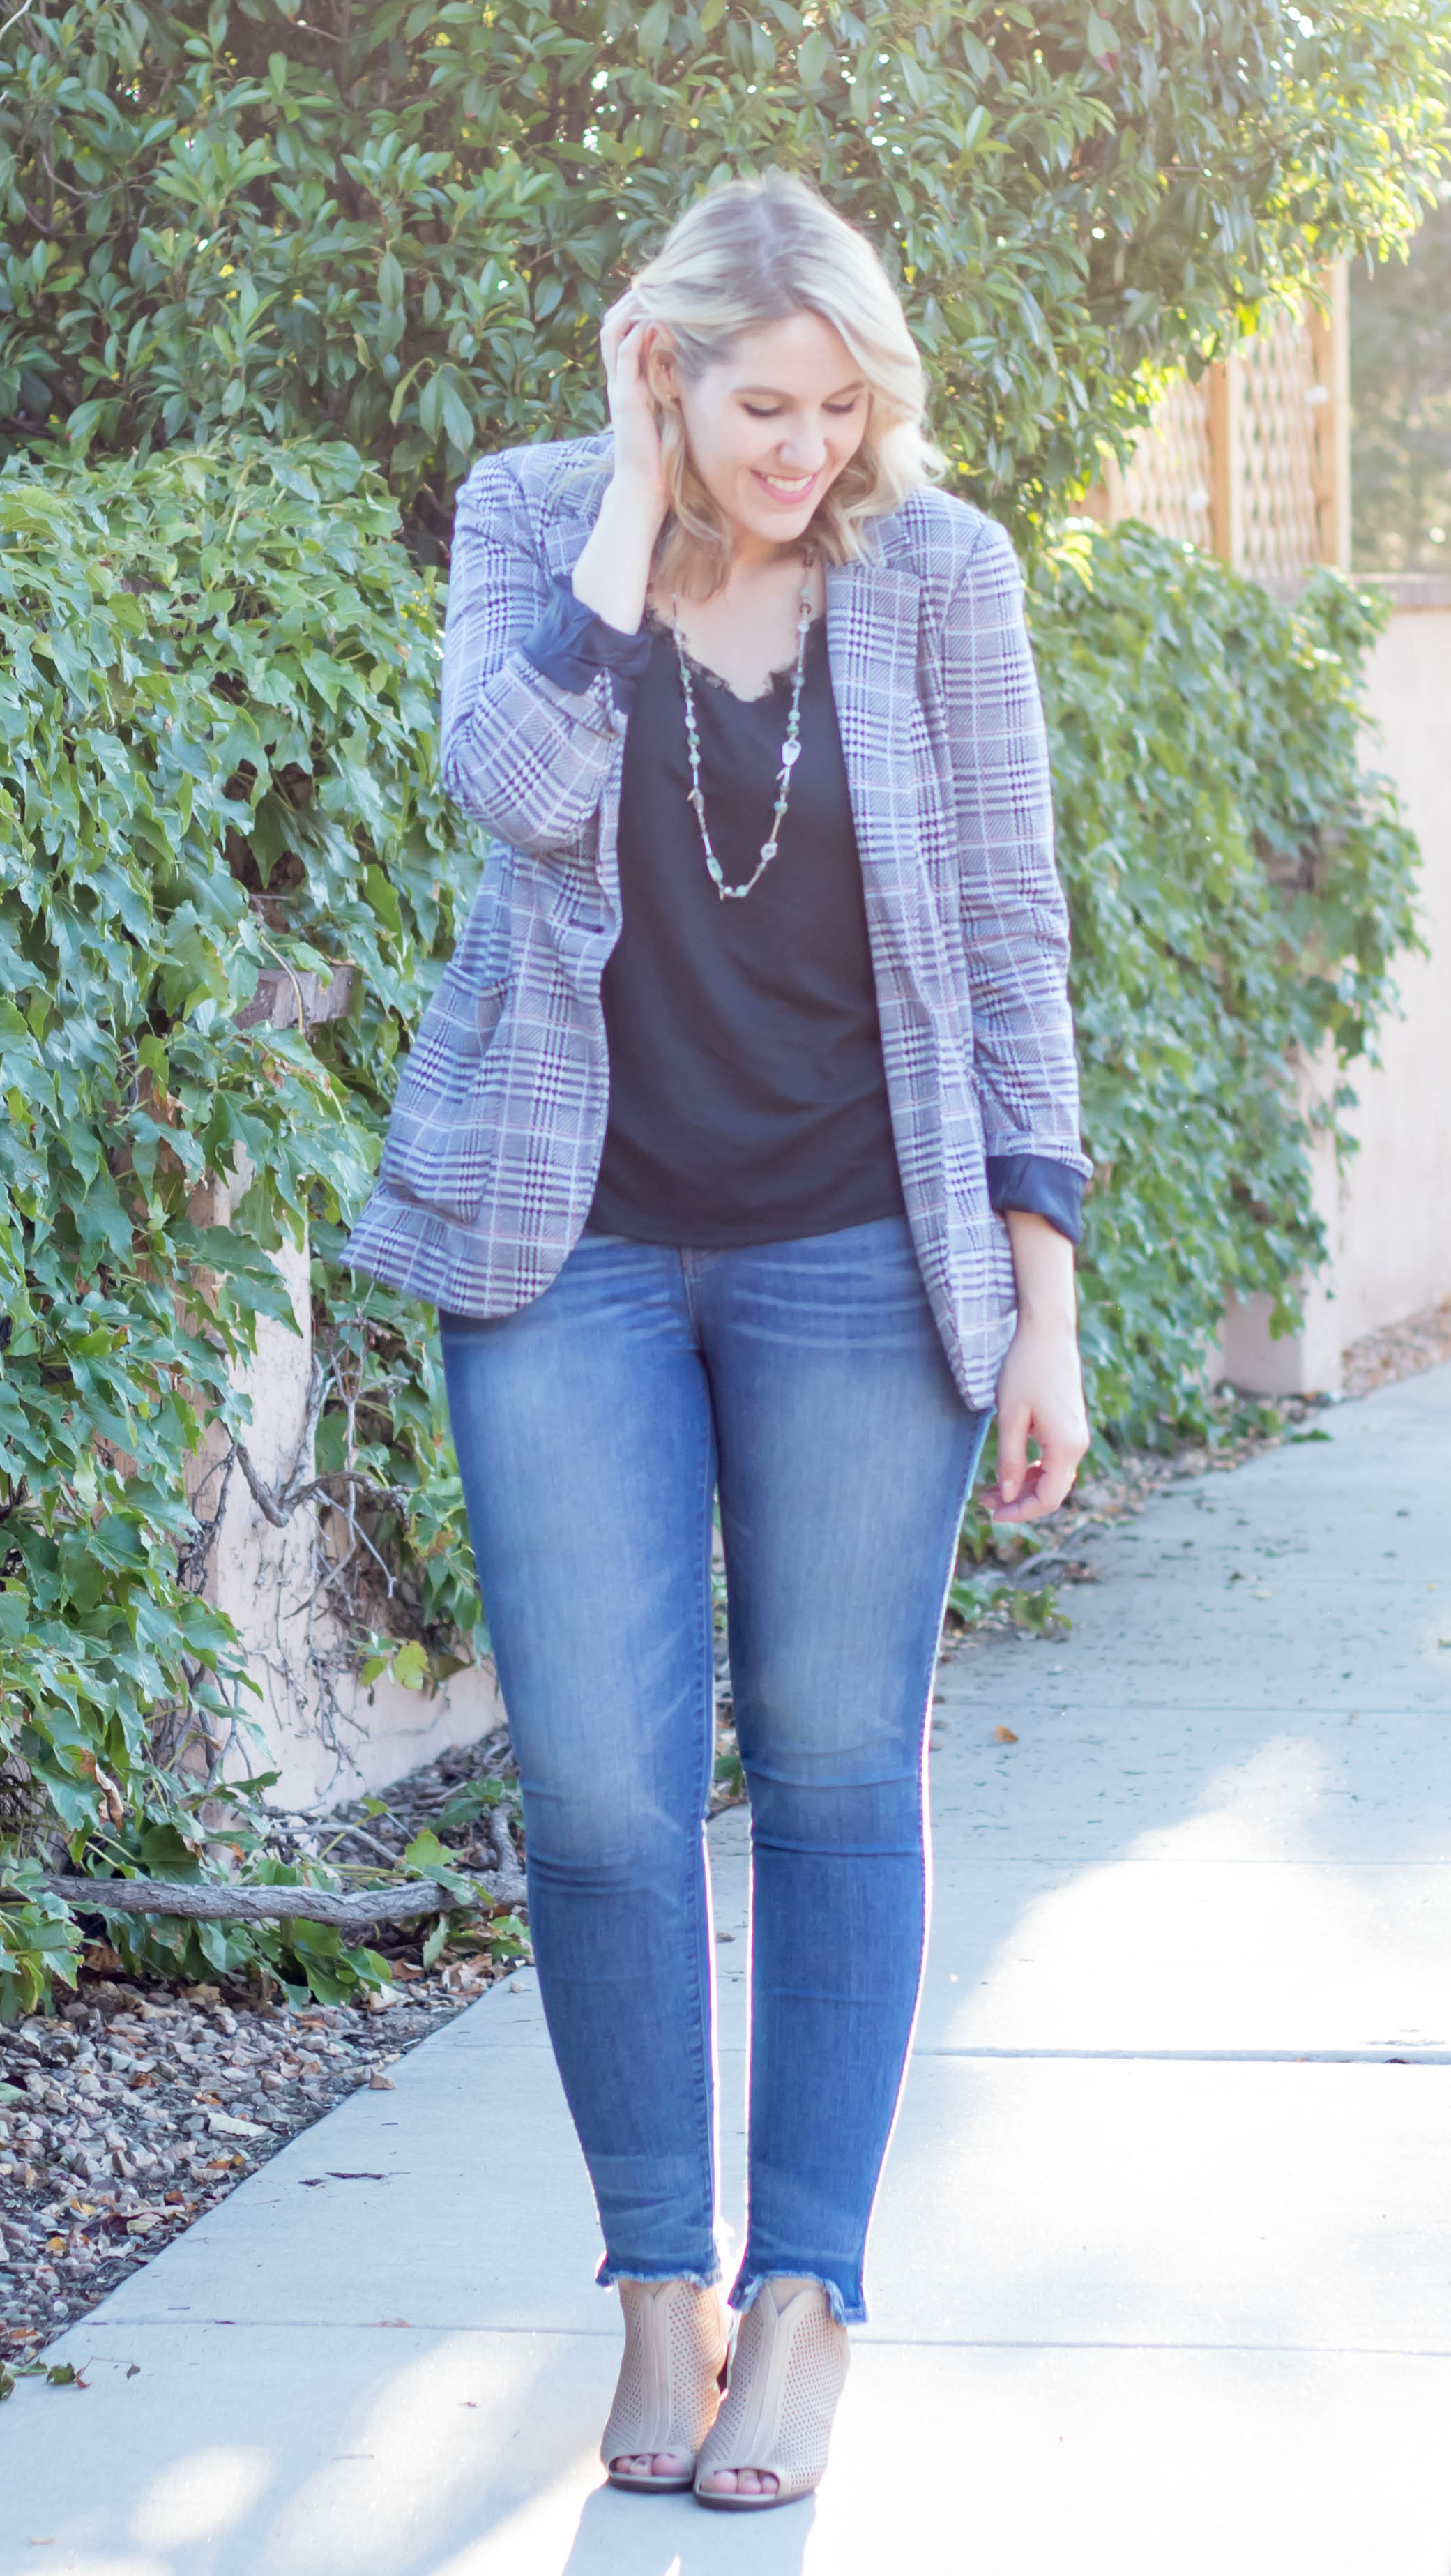 madewell jeans outfit #madewell #blazer #fallfashion #fall